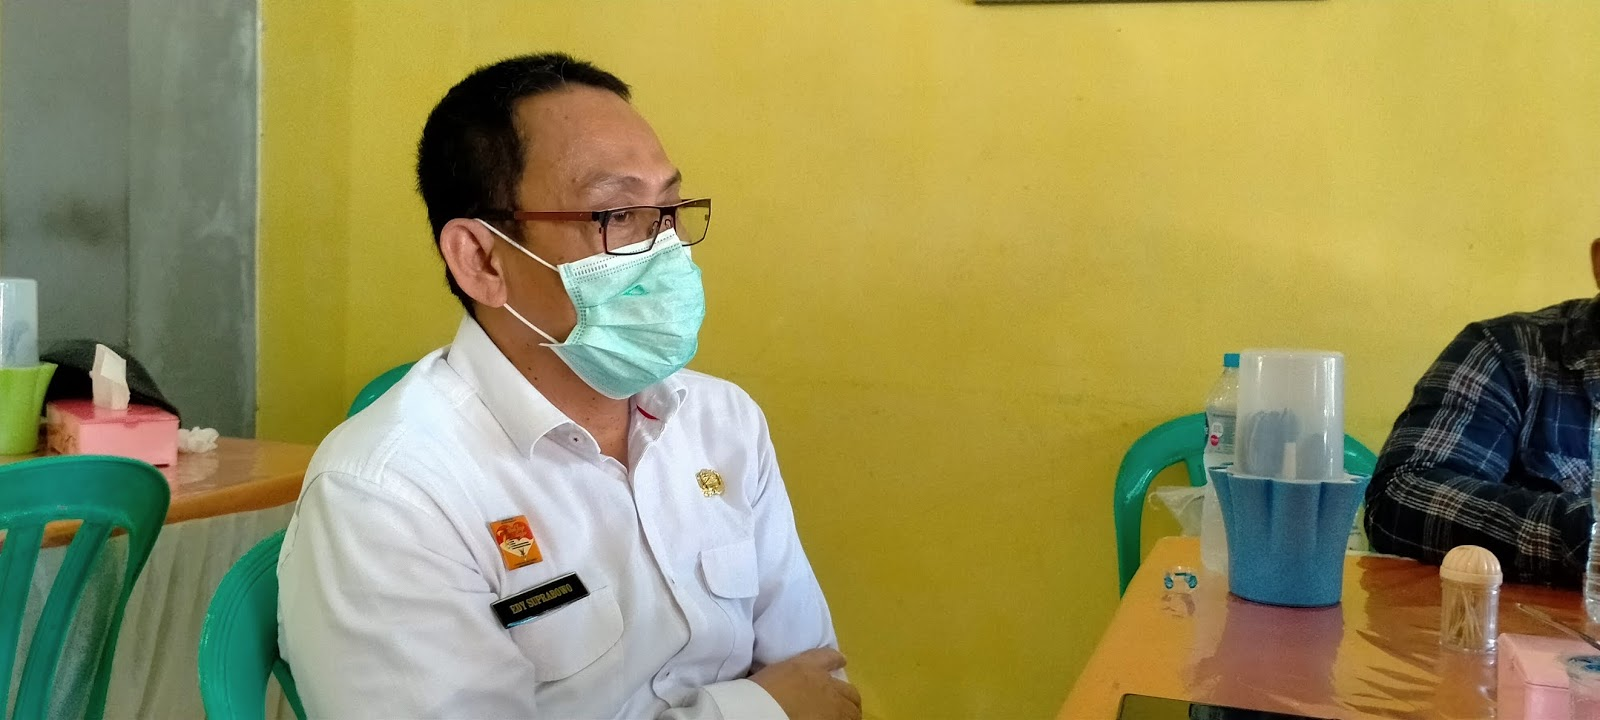 Terkait Surat Yang di Keluarkanya Direktur RSUD M Th Djaman Beri Karifikasi dan Permohonan Maaf